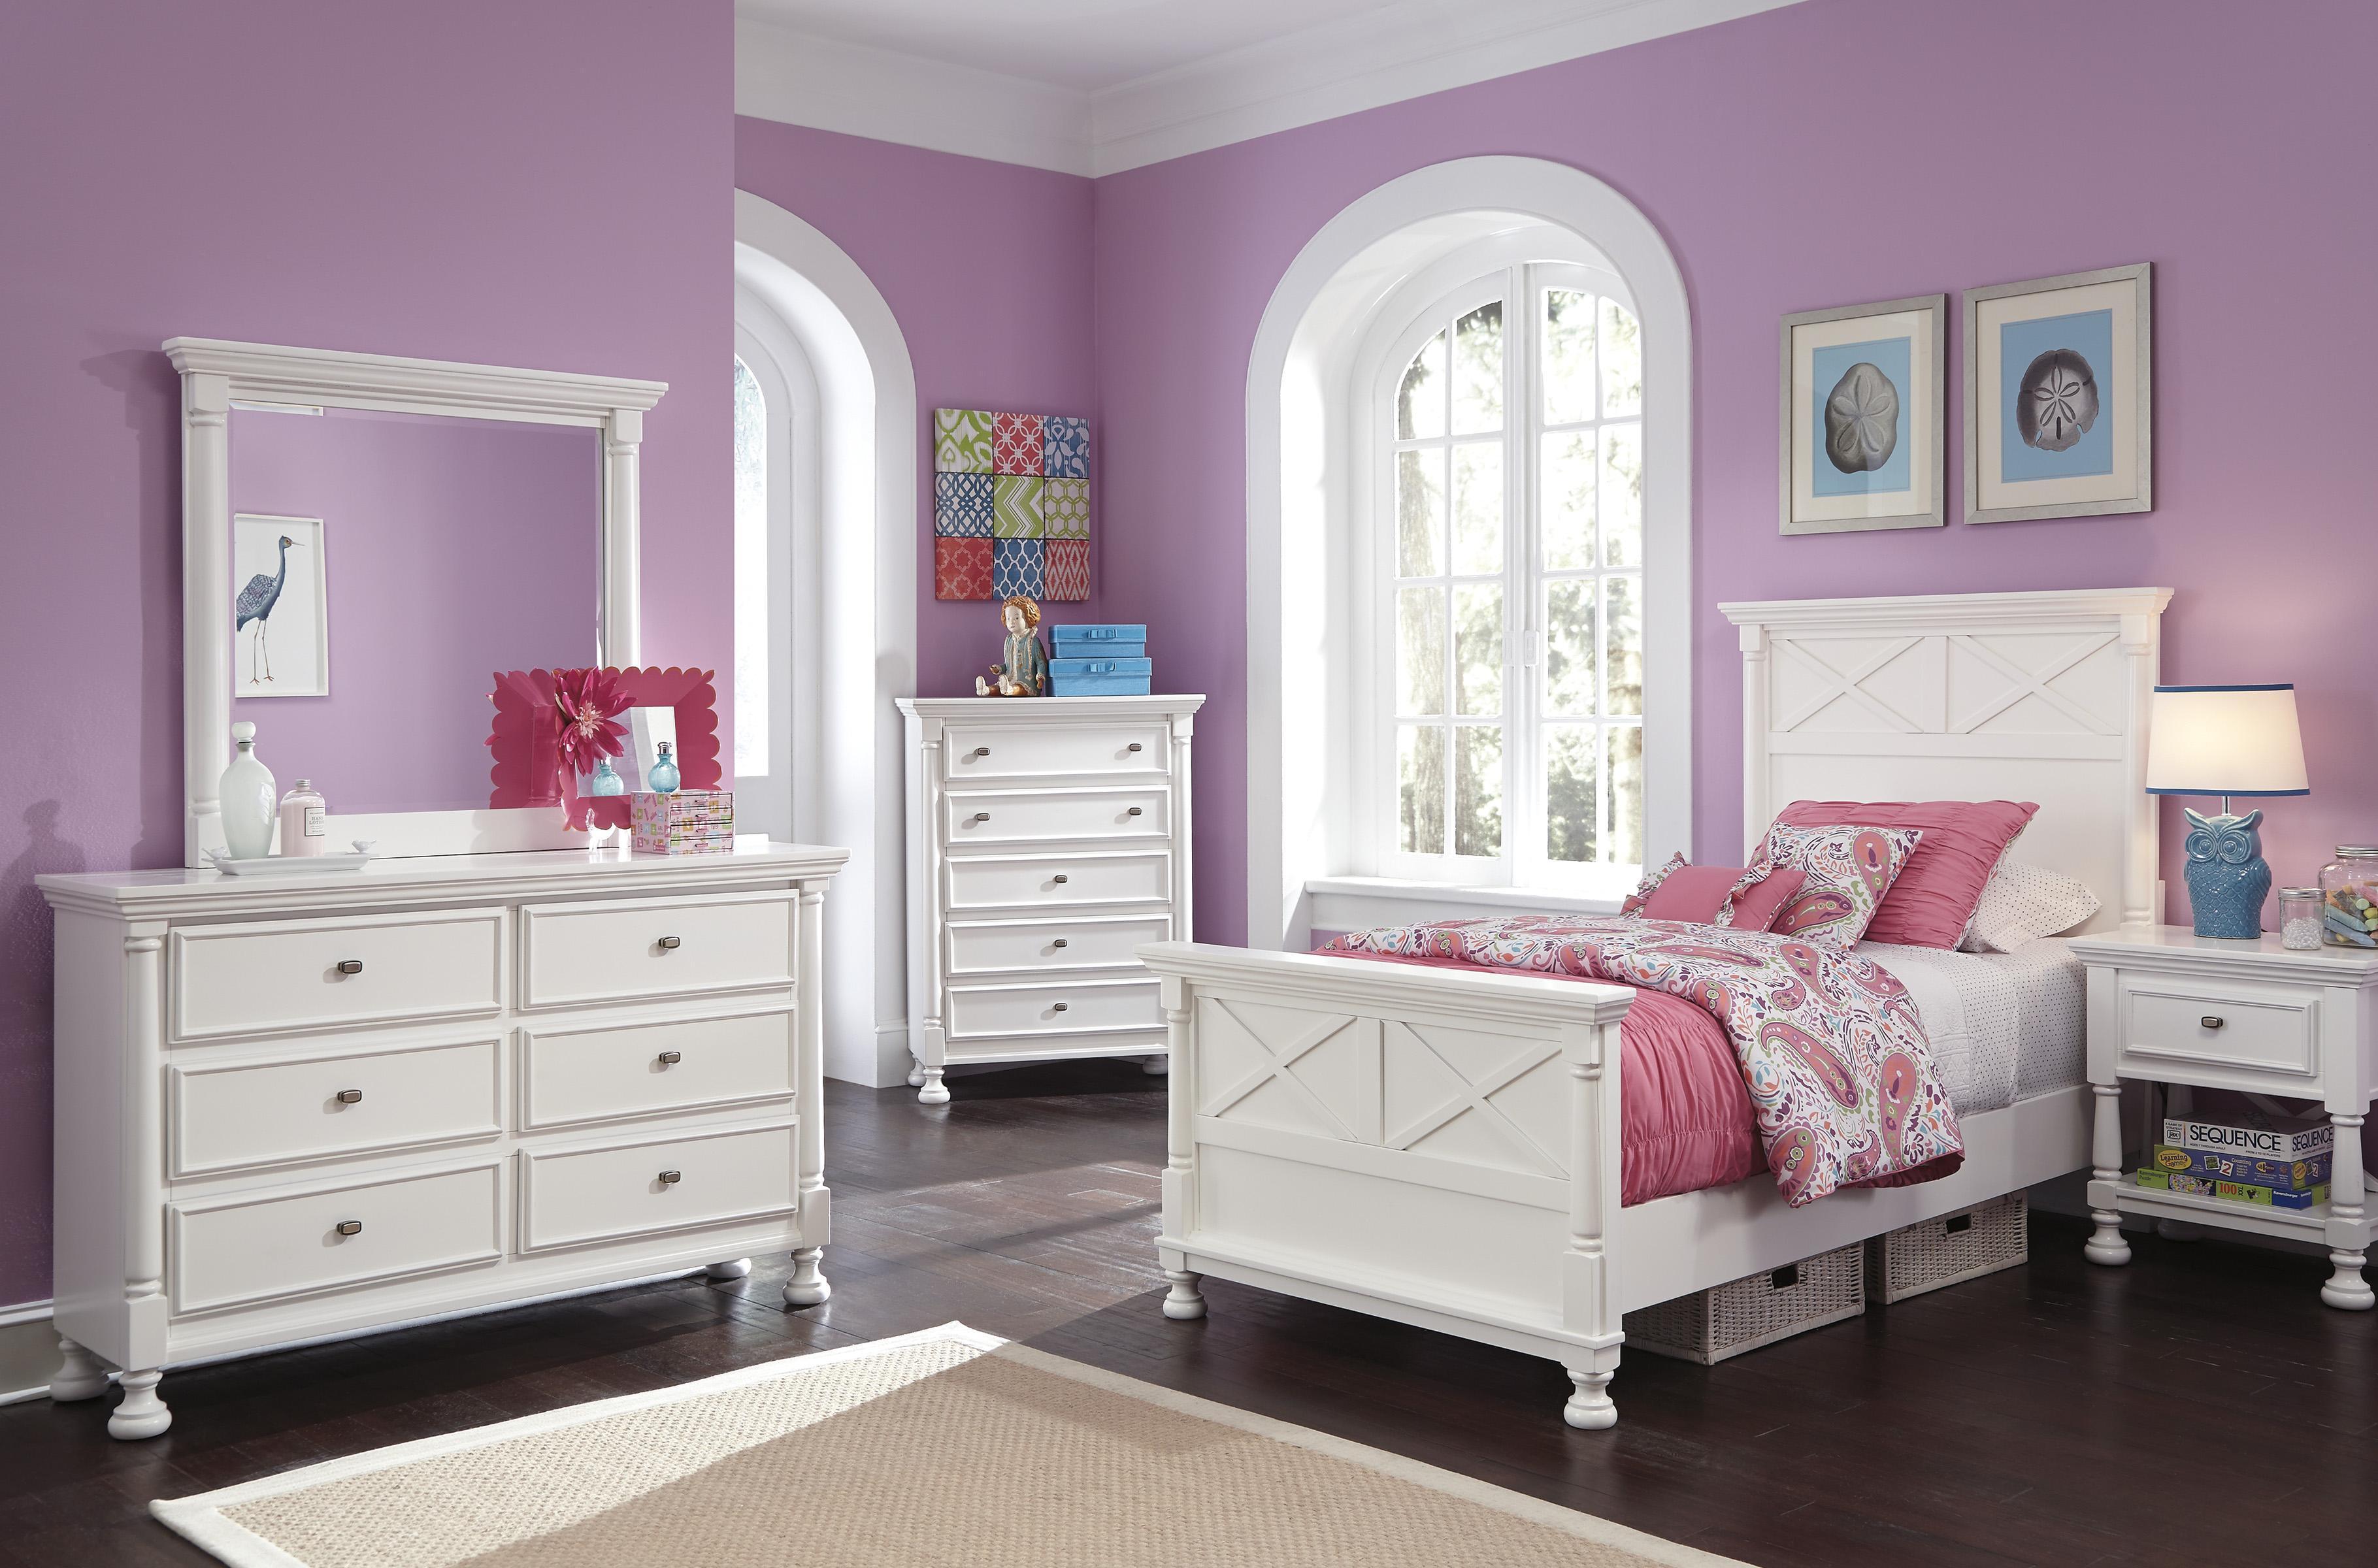 4-PC Twin Bedroom